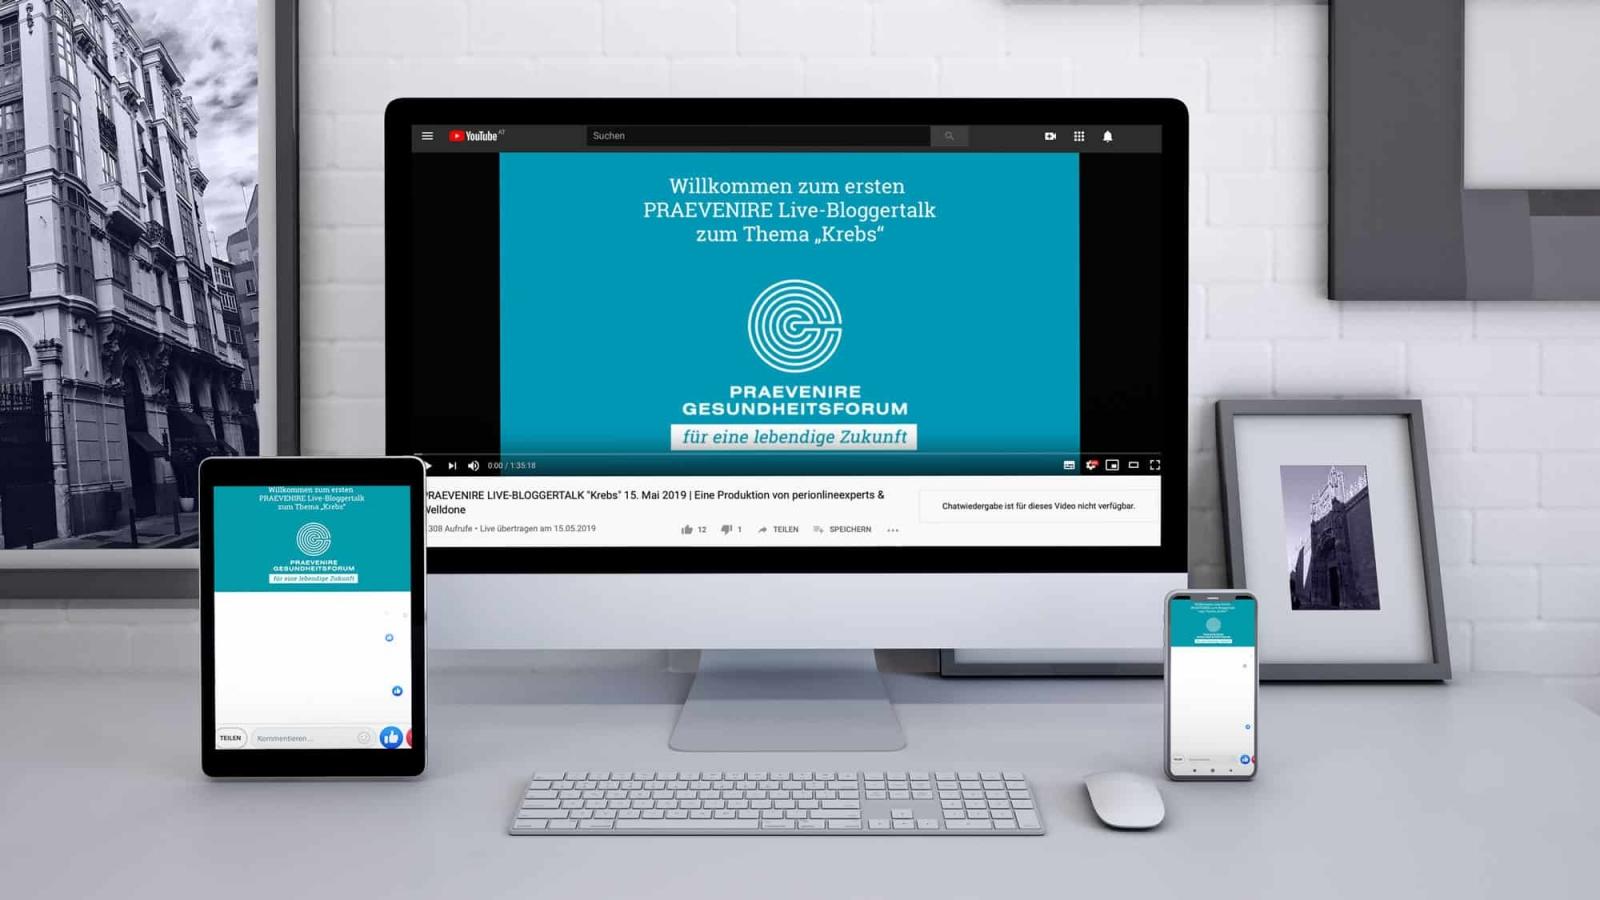 perionlineexperts-peri-onlineexperts-social-media-socialmedia-mockup-praevenire-gesundheitsforum-bloggertalk-krebs-live-livestream-stream